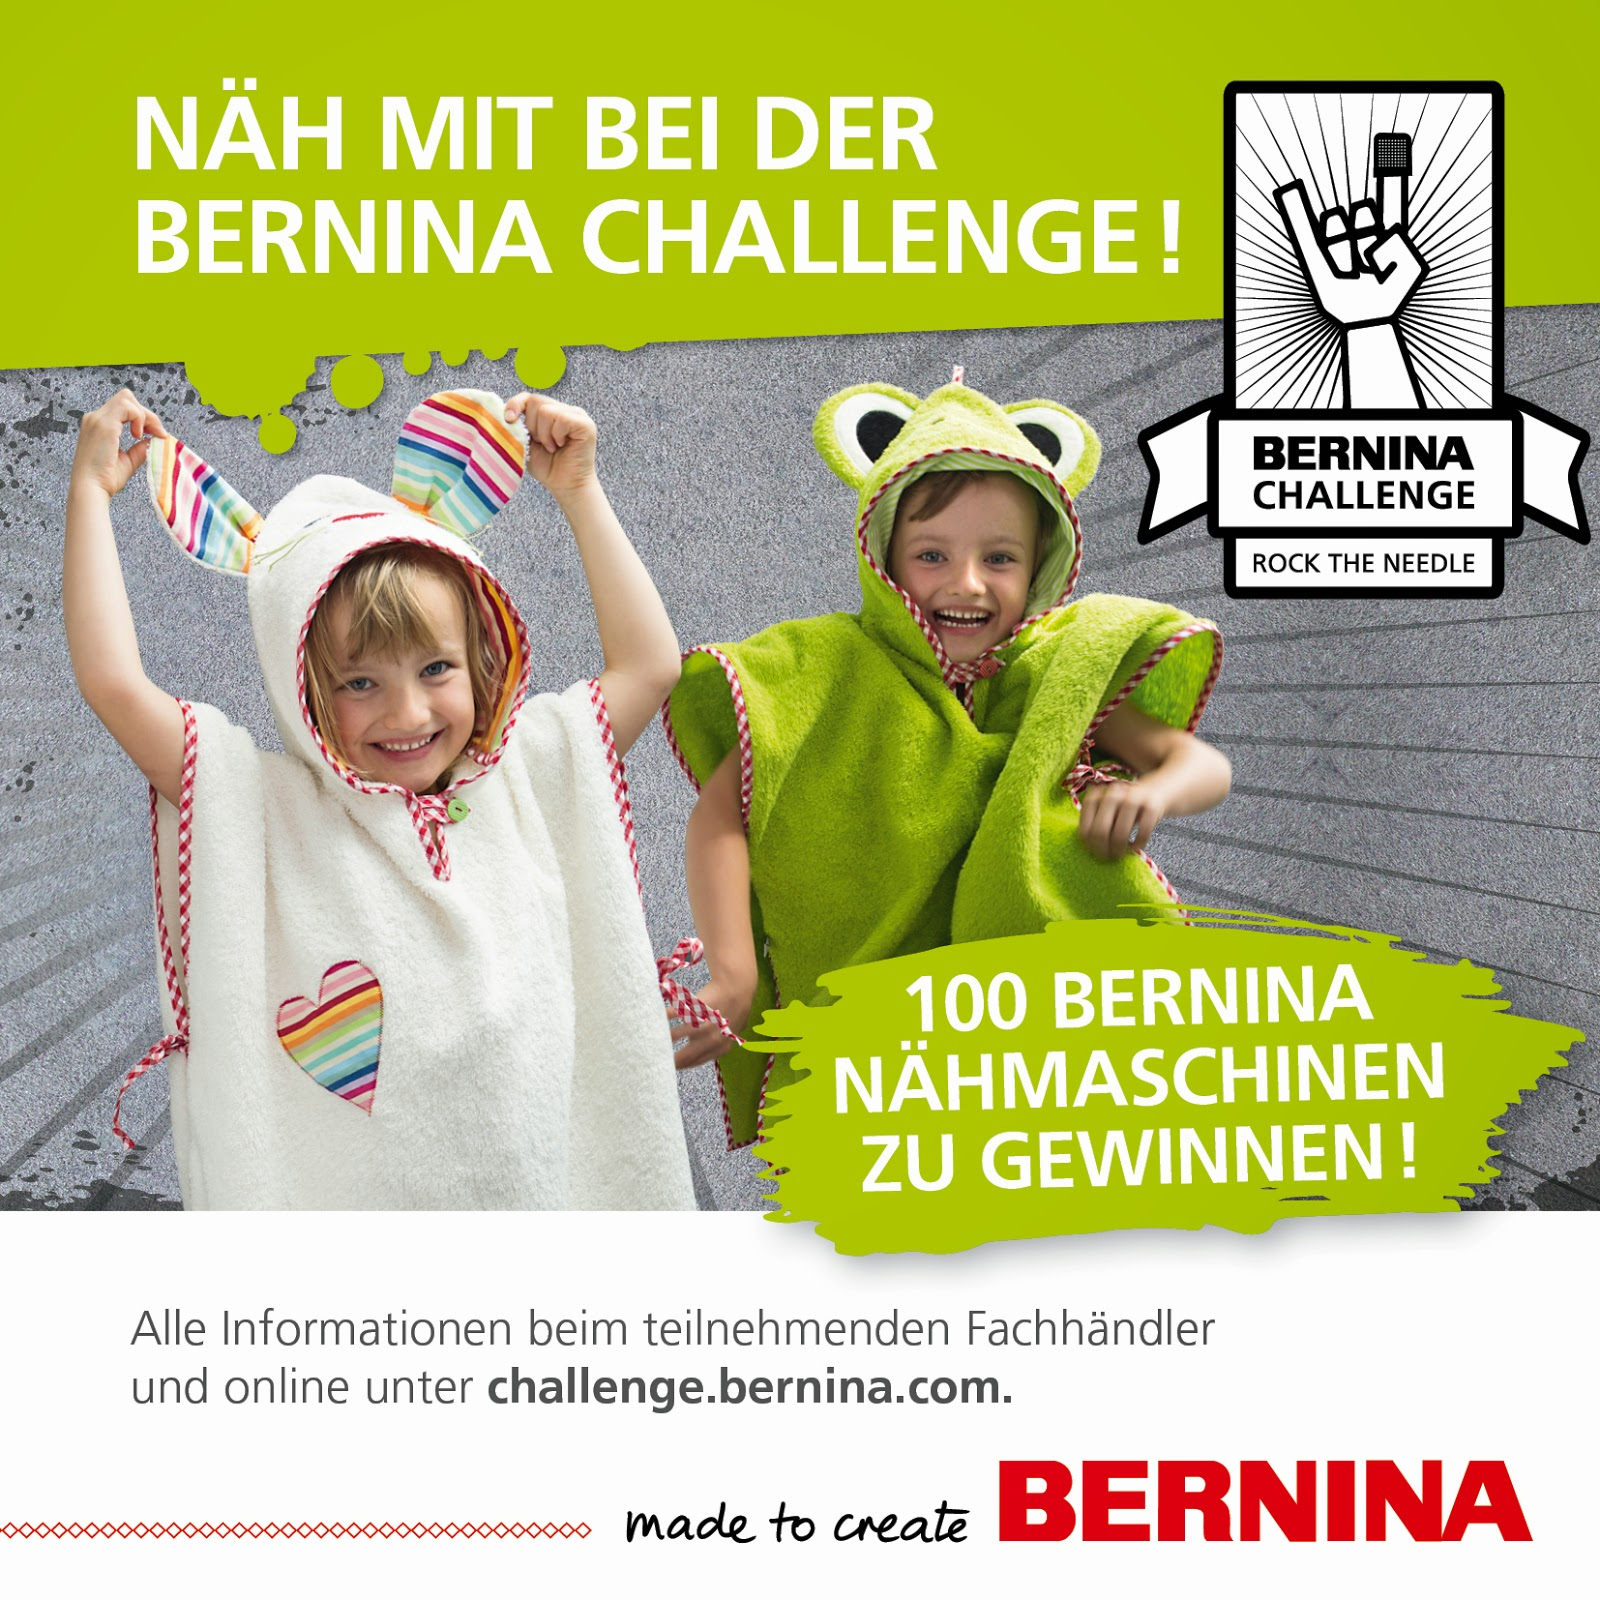 www.challenge.bernina.com/?utm_source=hermine%20termine